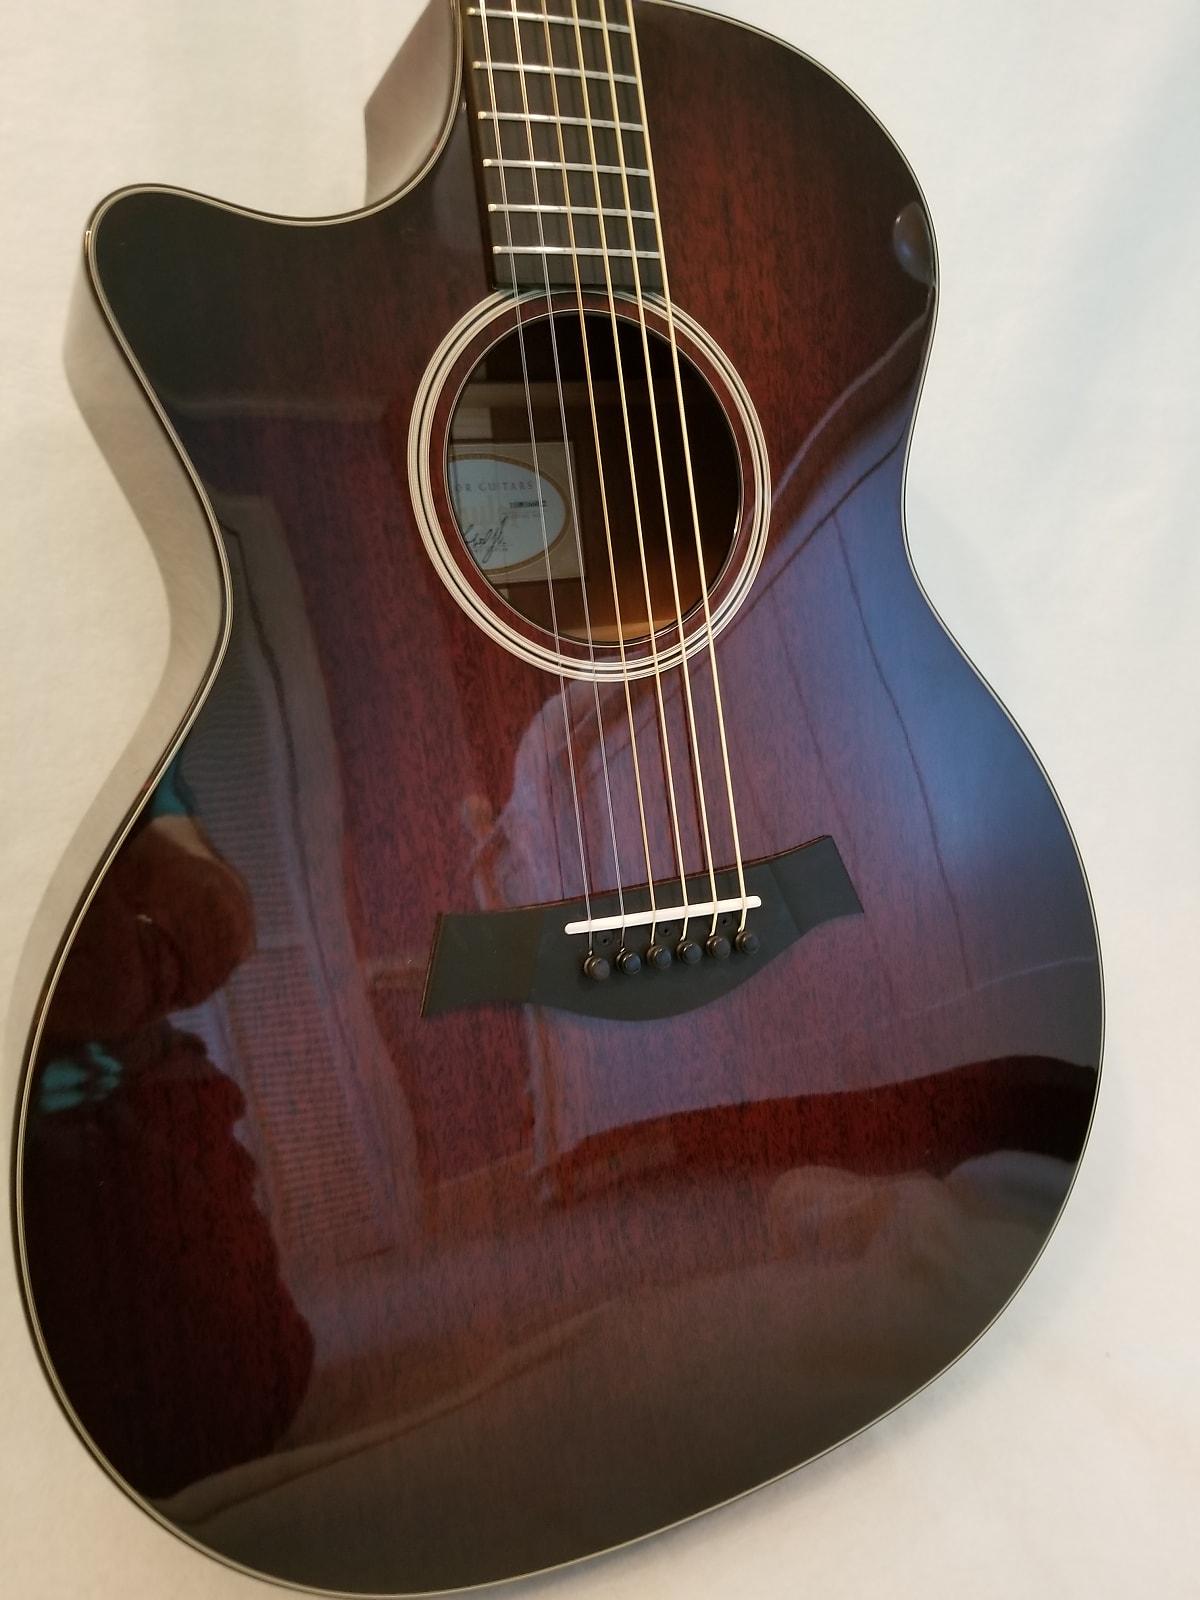 Taylor 524ce Left Handed 2013 Mahogany Burst Edge Gloss Includes Taylor Case